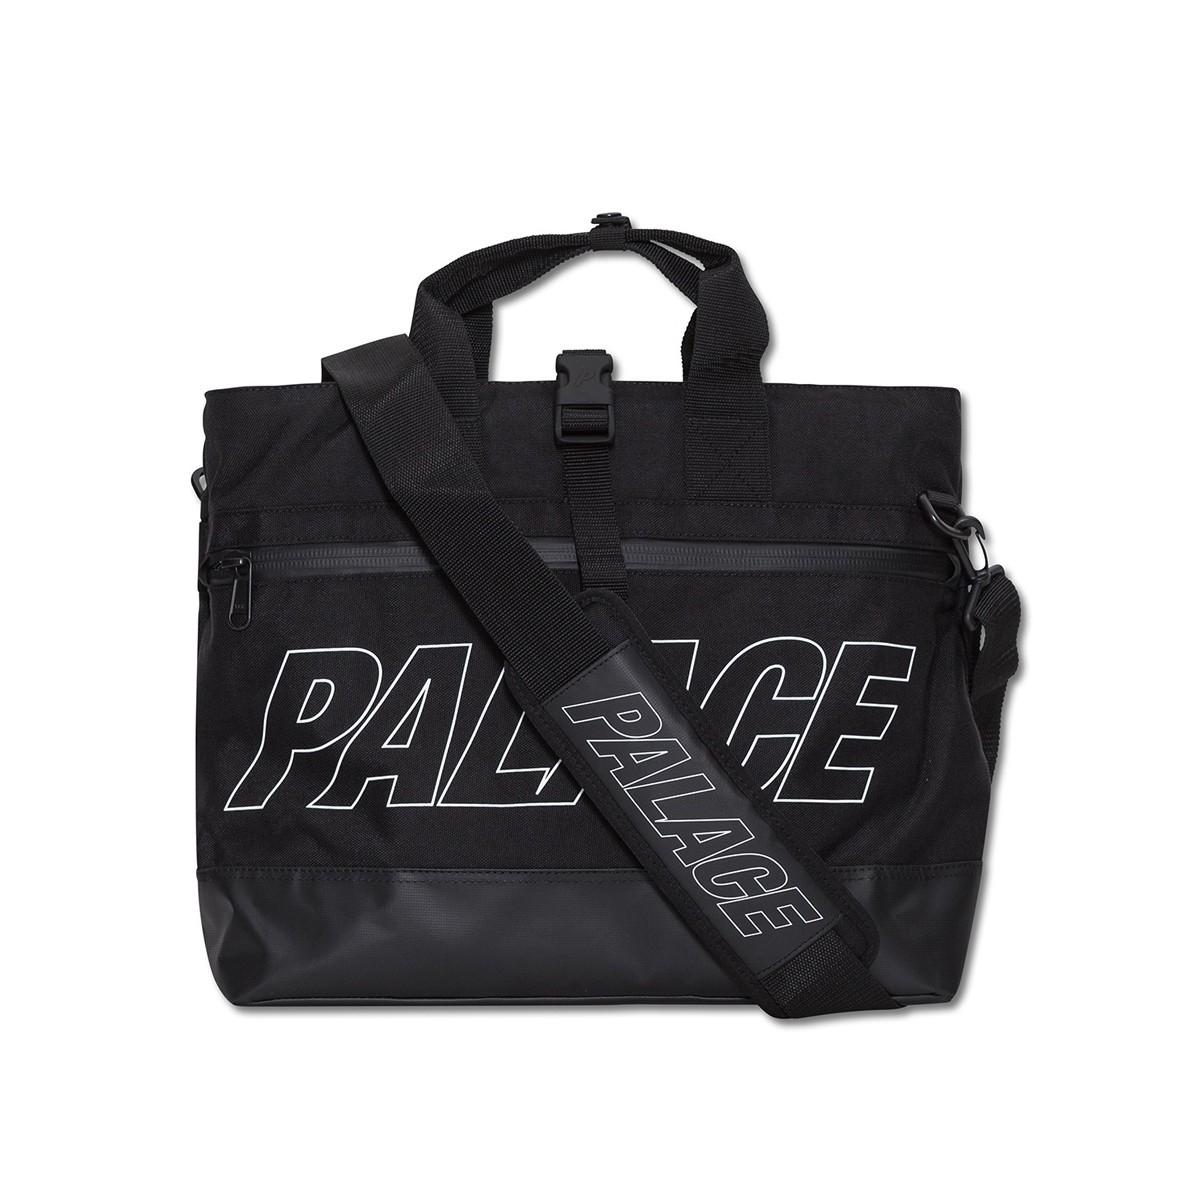 Palace Shopper Bag In Black